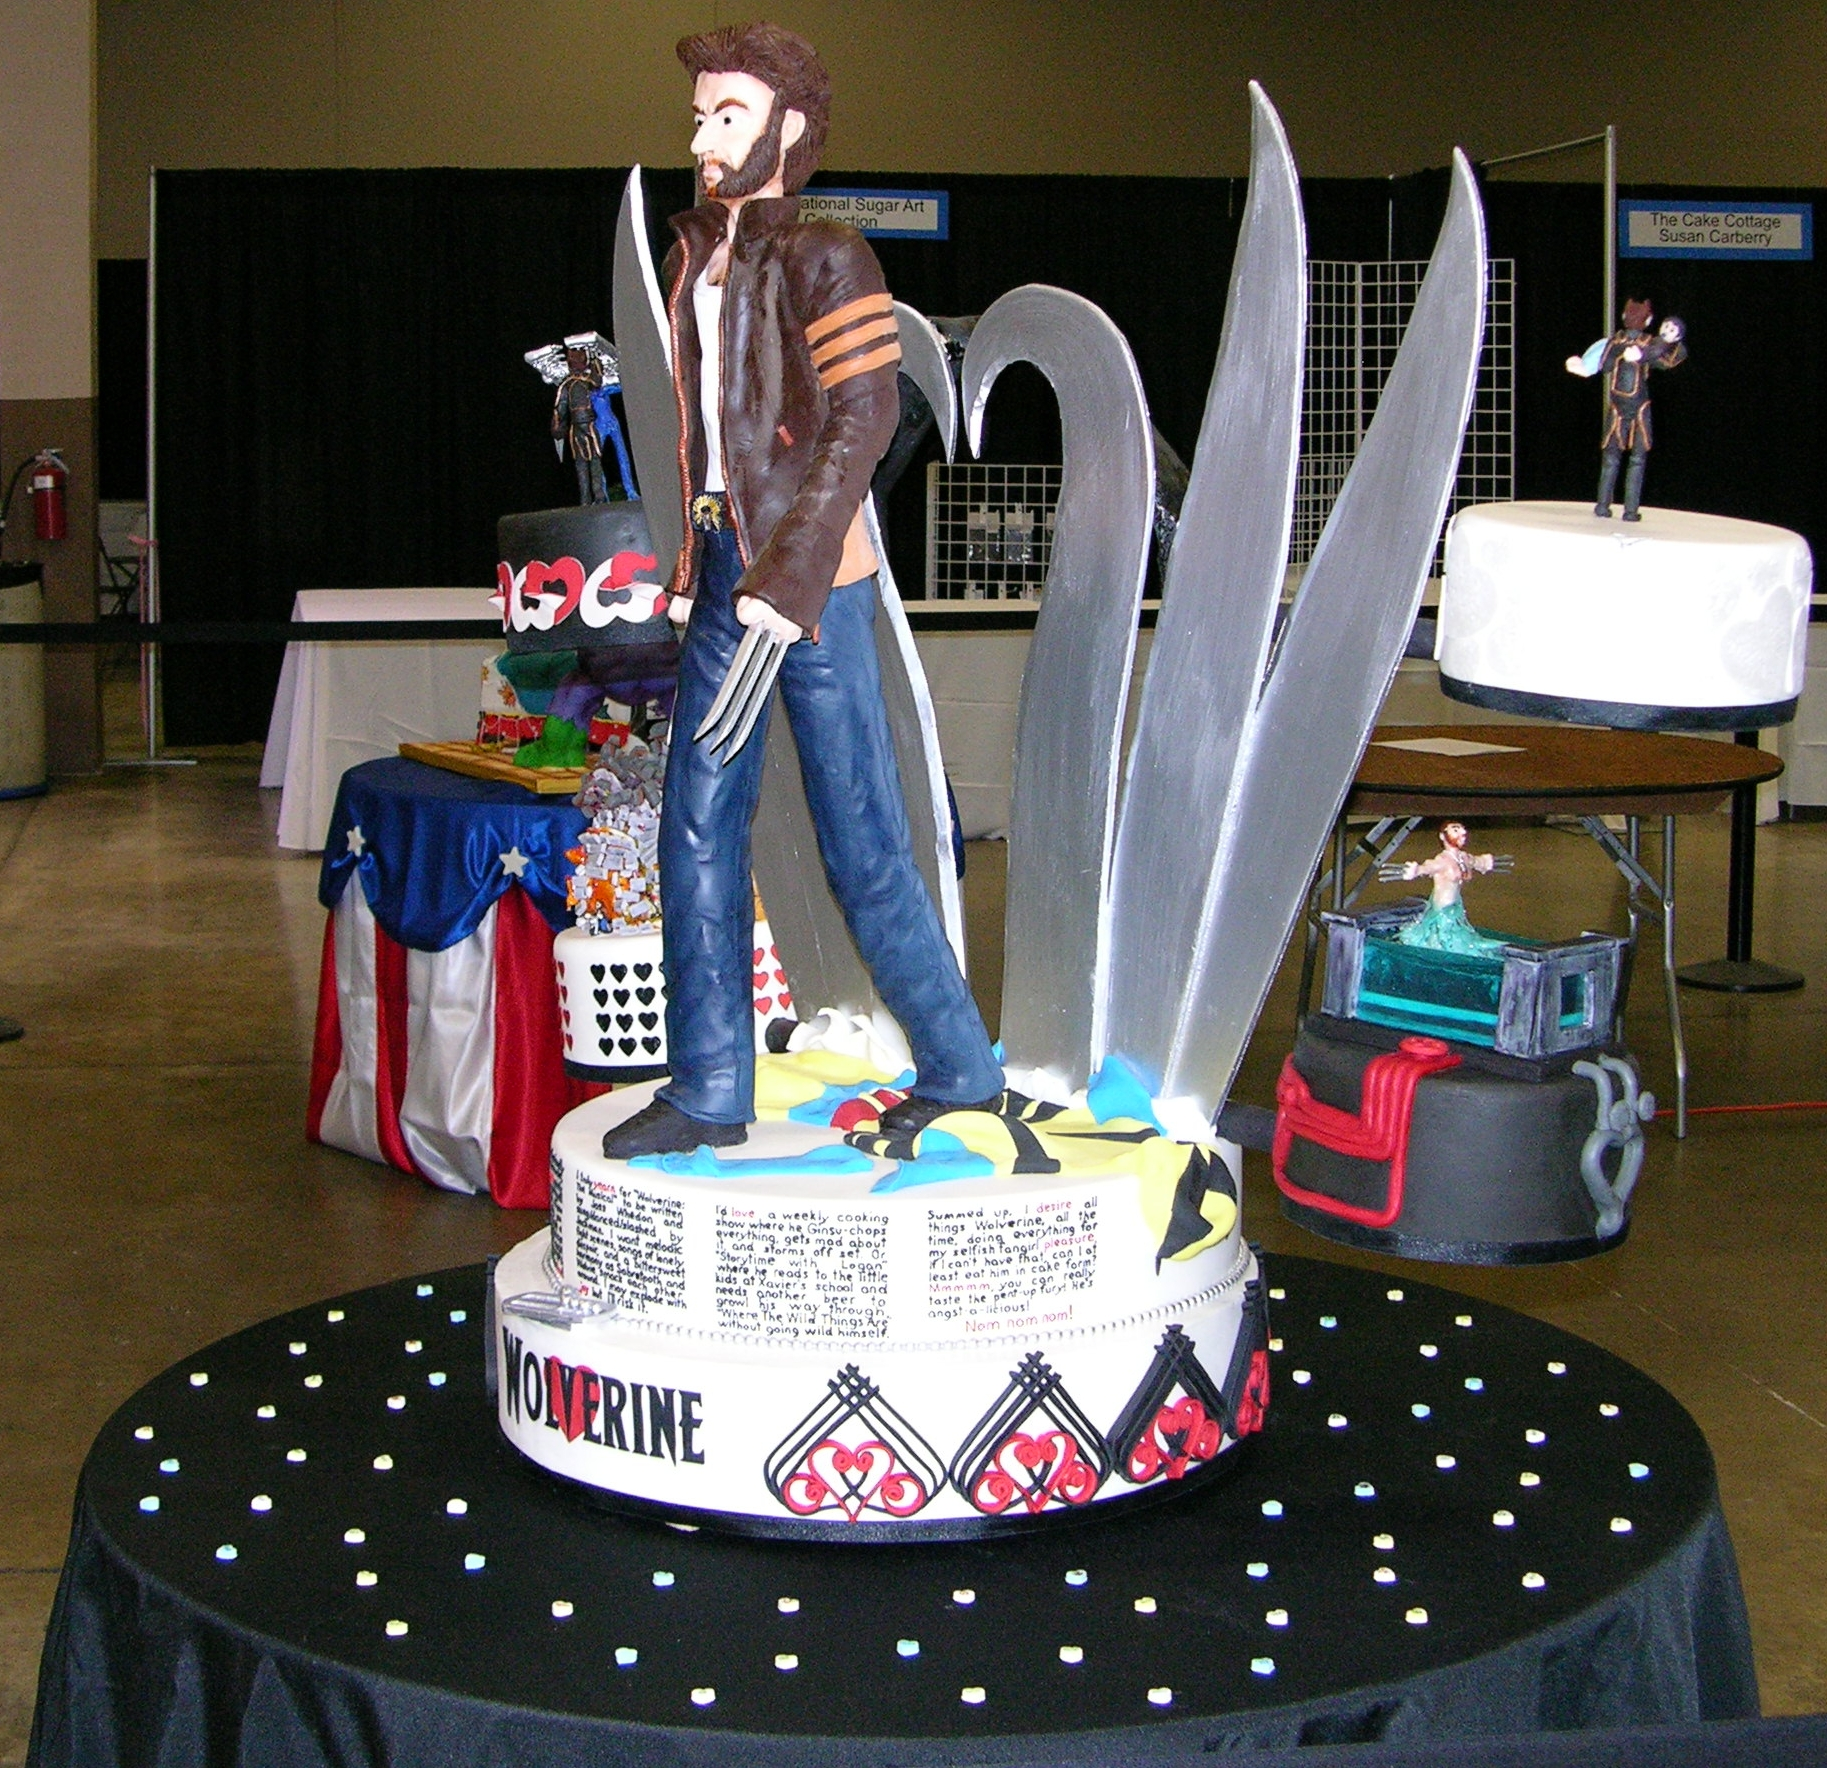 Kimberly Chapman S Cake Decorating Wolverine Fangirl